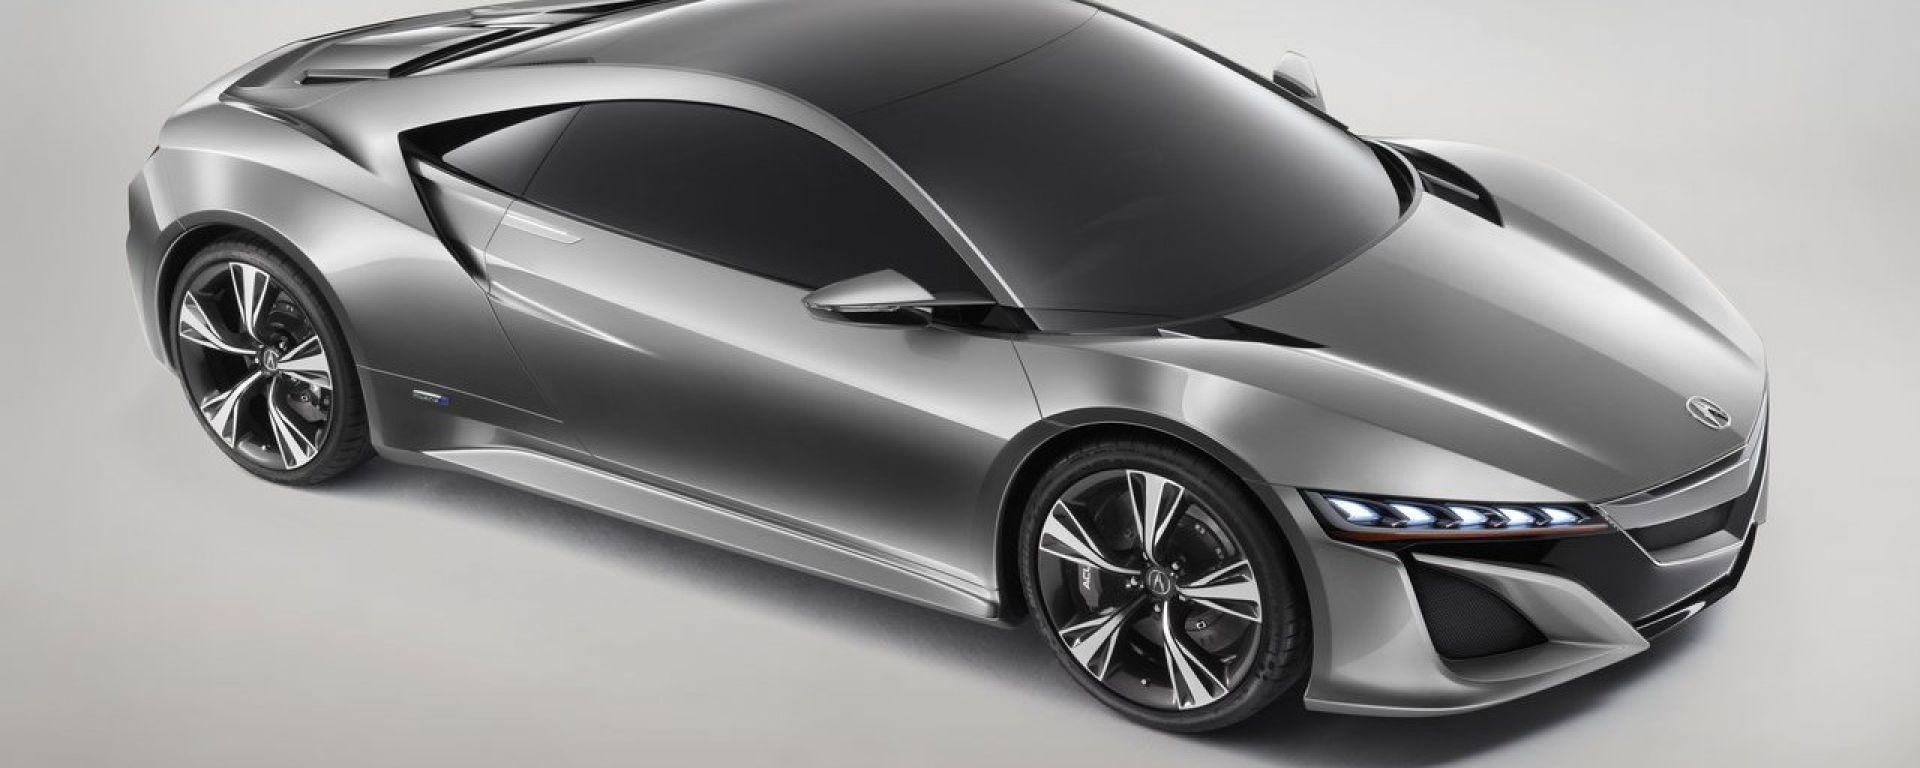 Acura - Honda NSX Concept